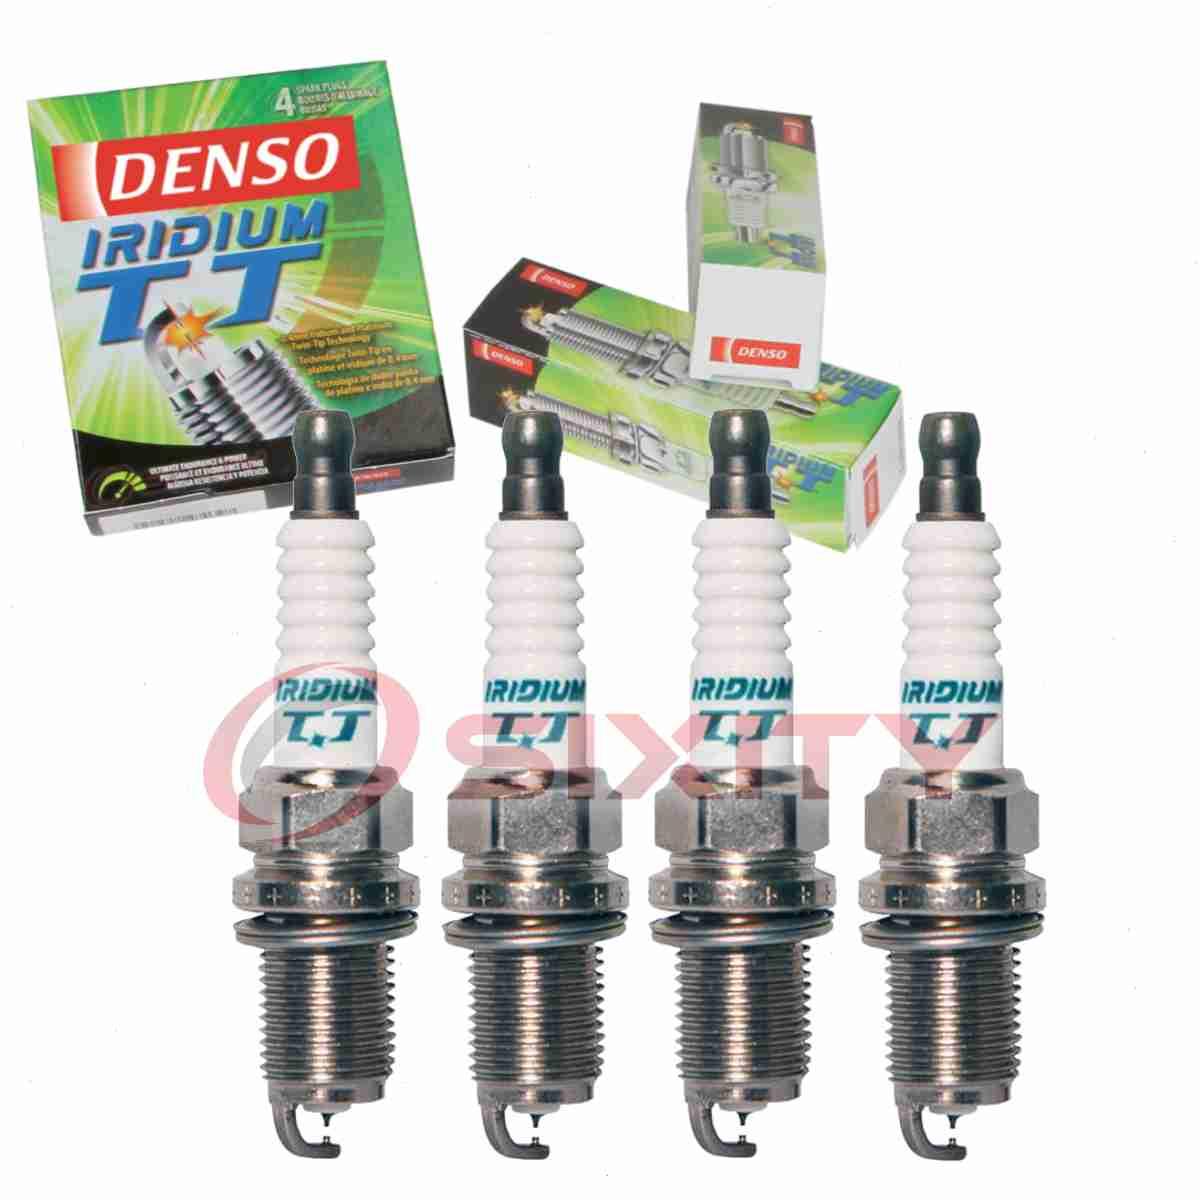 4x OPEL ASTRA F 1.6 i ORIG DENSO Iridium Power SPARK PLUGS